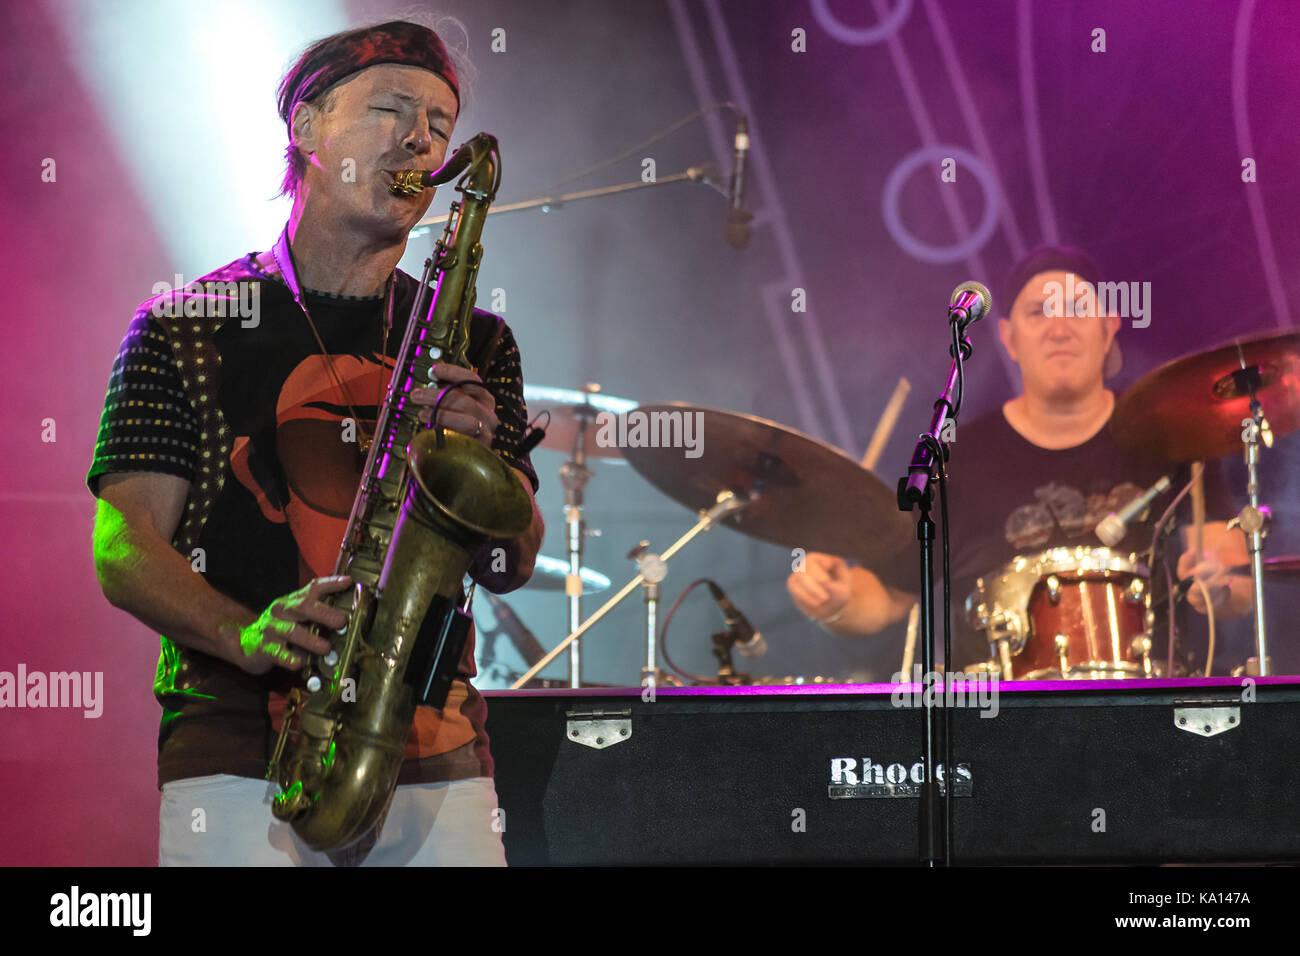 NIS, SERBIA - AUGUST 13: American jazz saxophonist Bill